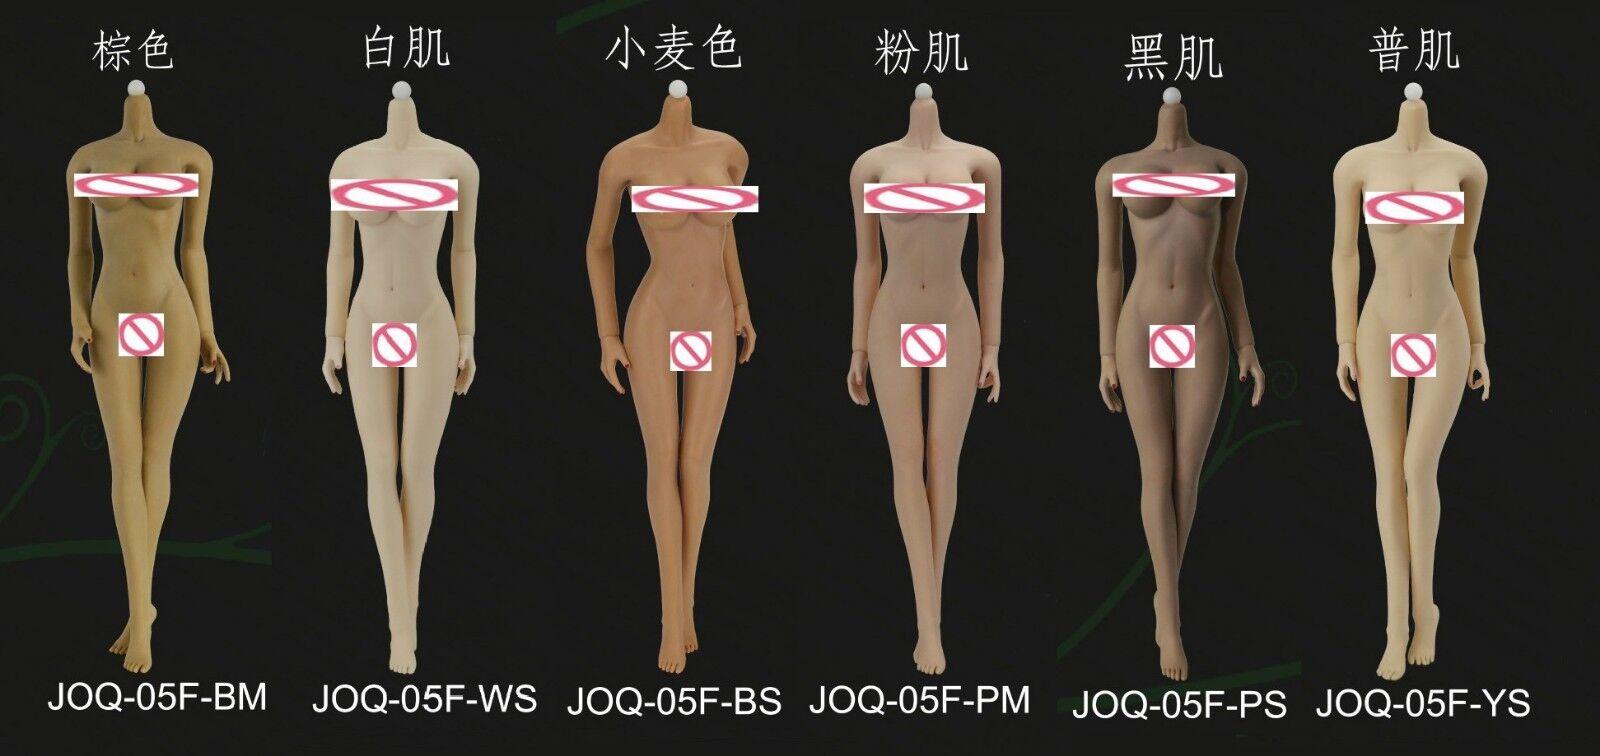 1 6 JIAOU DOLL Flexible European groß bust Körper Non Dismantle Foot Female Figure